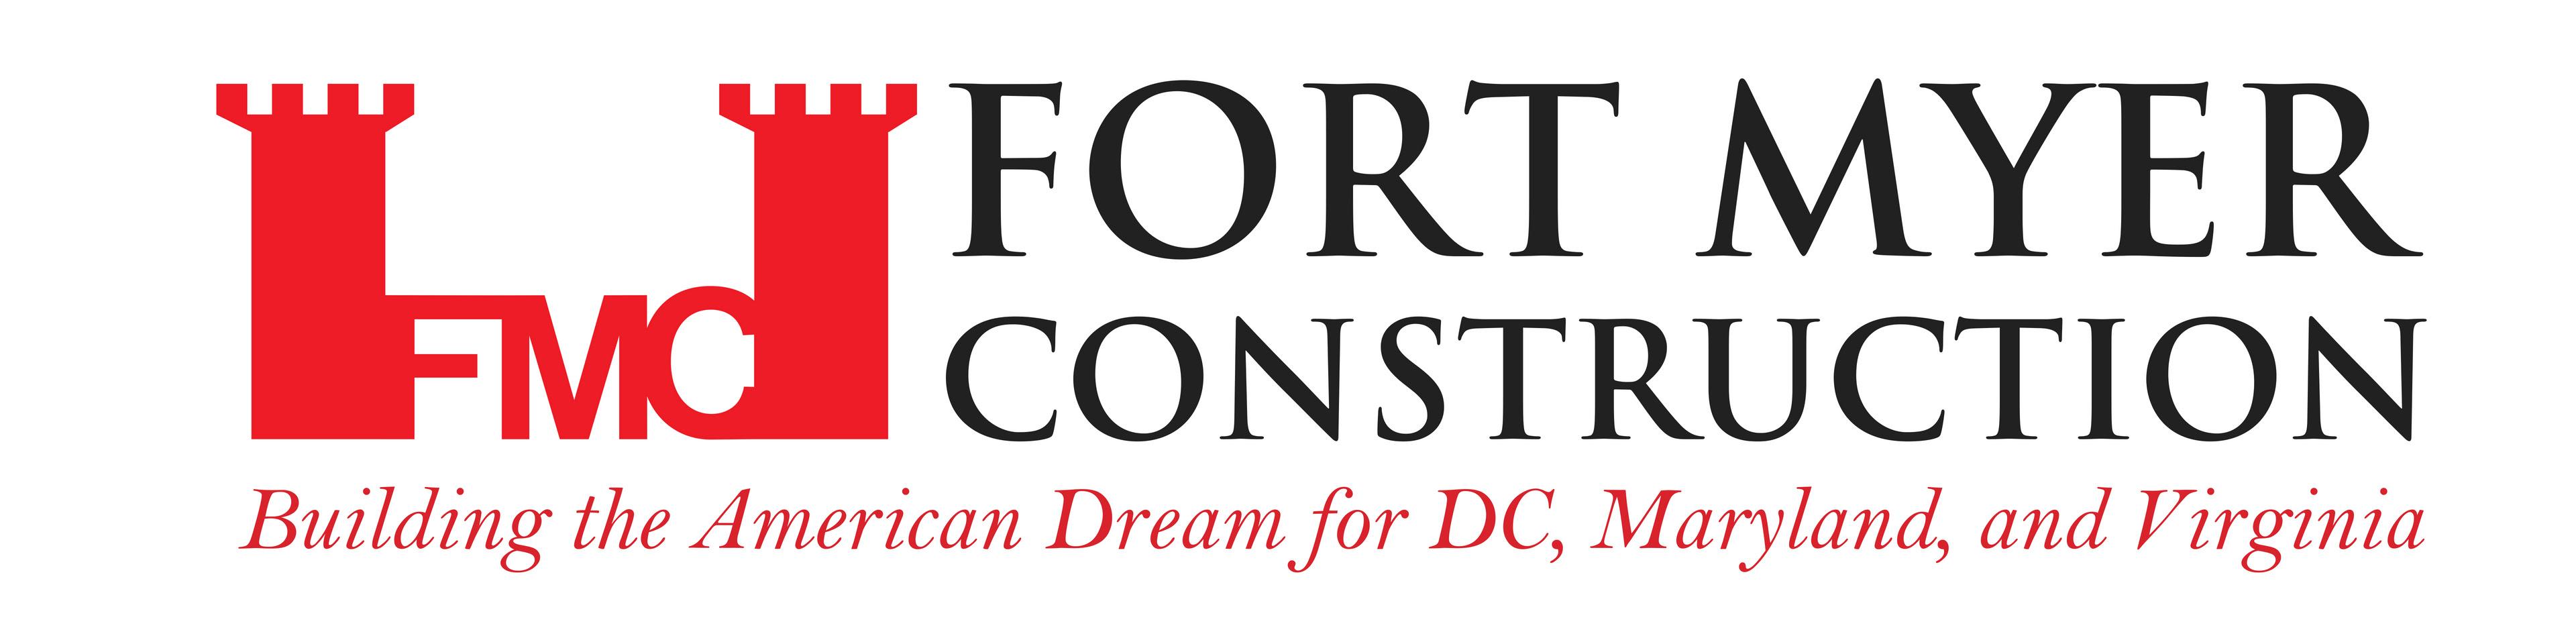 https://campaign-image.com/zohocampaigns/117934000008643004_zc_v47_fmcc_logo_horizontal_(1).jpg